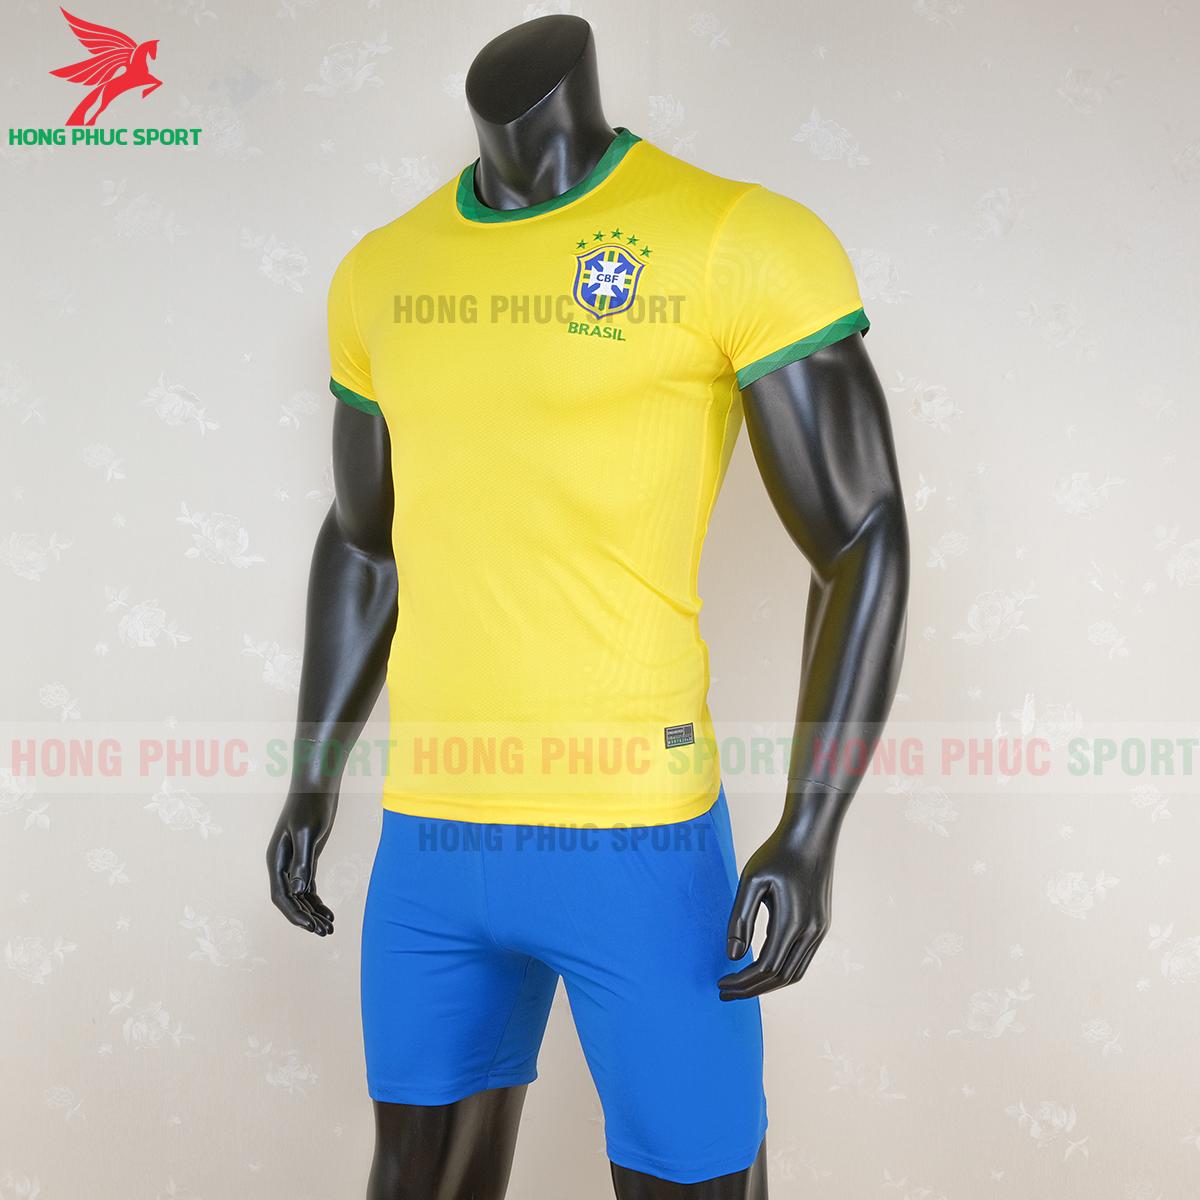 https://cdn.hongphucsport.com/unsafe/s4.shopbay.vn/files/285/ao-bong-da-tuyen-brazil-2020-2021-san-nha-4-5f716991c479d.png